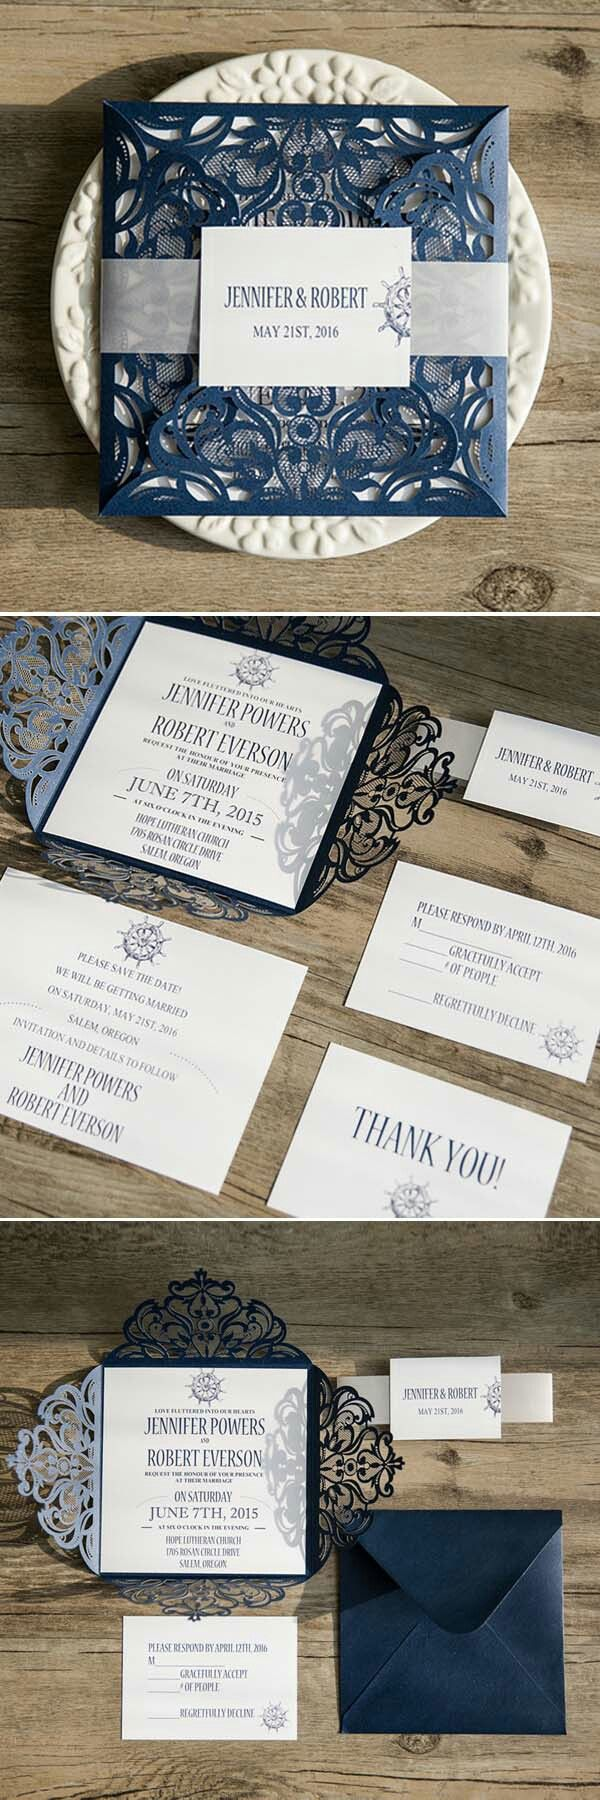 nautical wedding invitations uk%0A Dream wedding plans